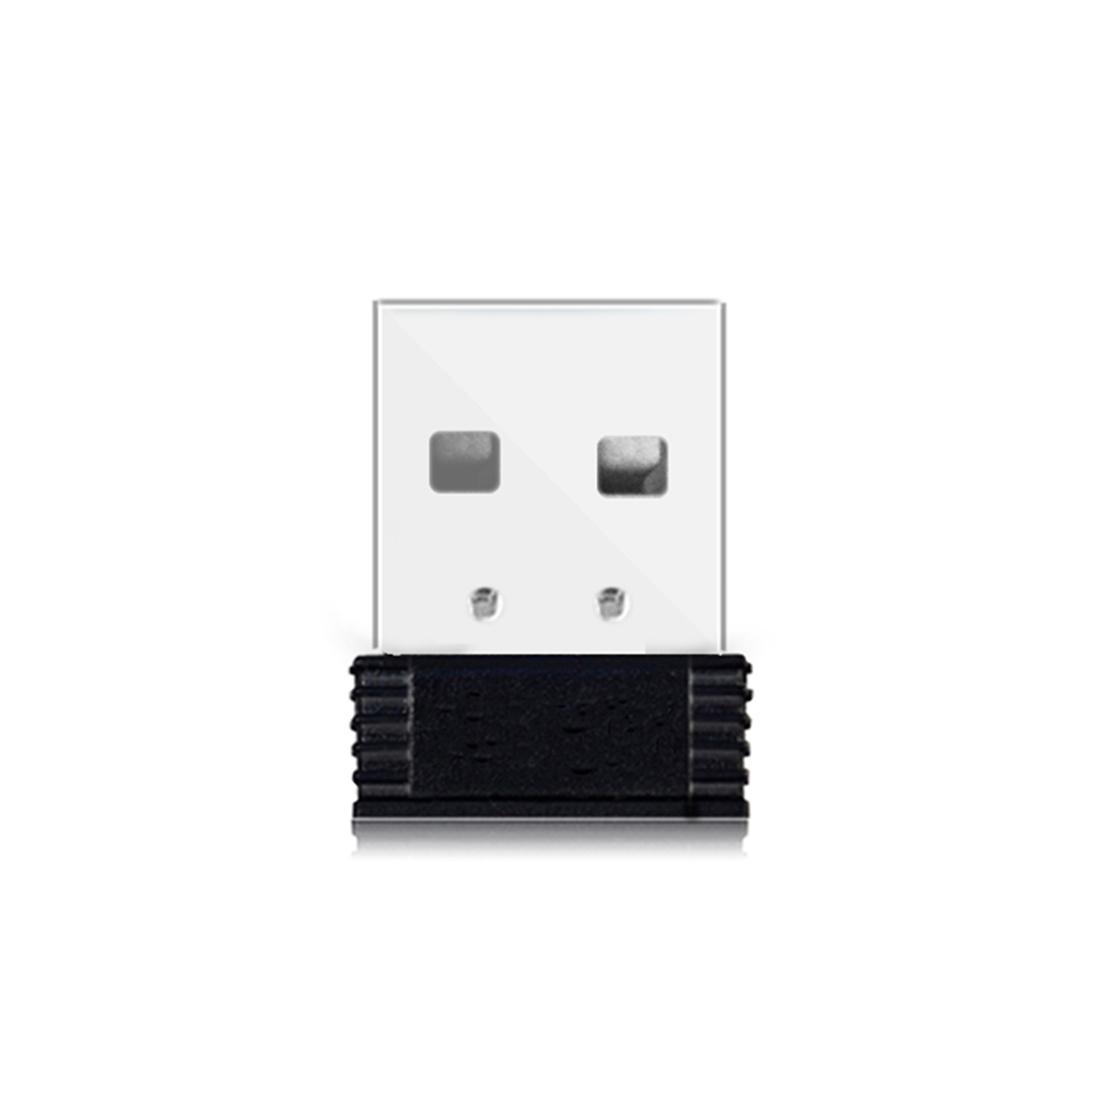 USB-адаптер D-Link DWA-121 / C1A